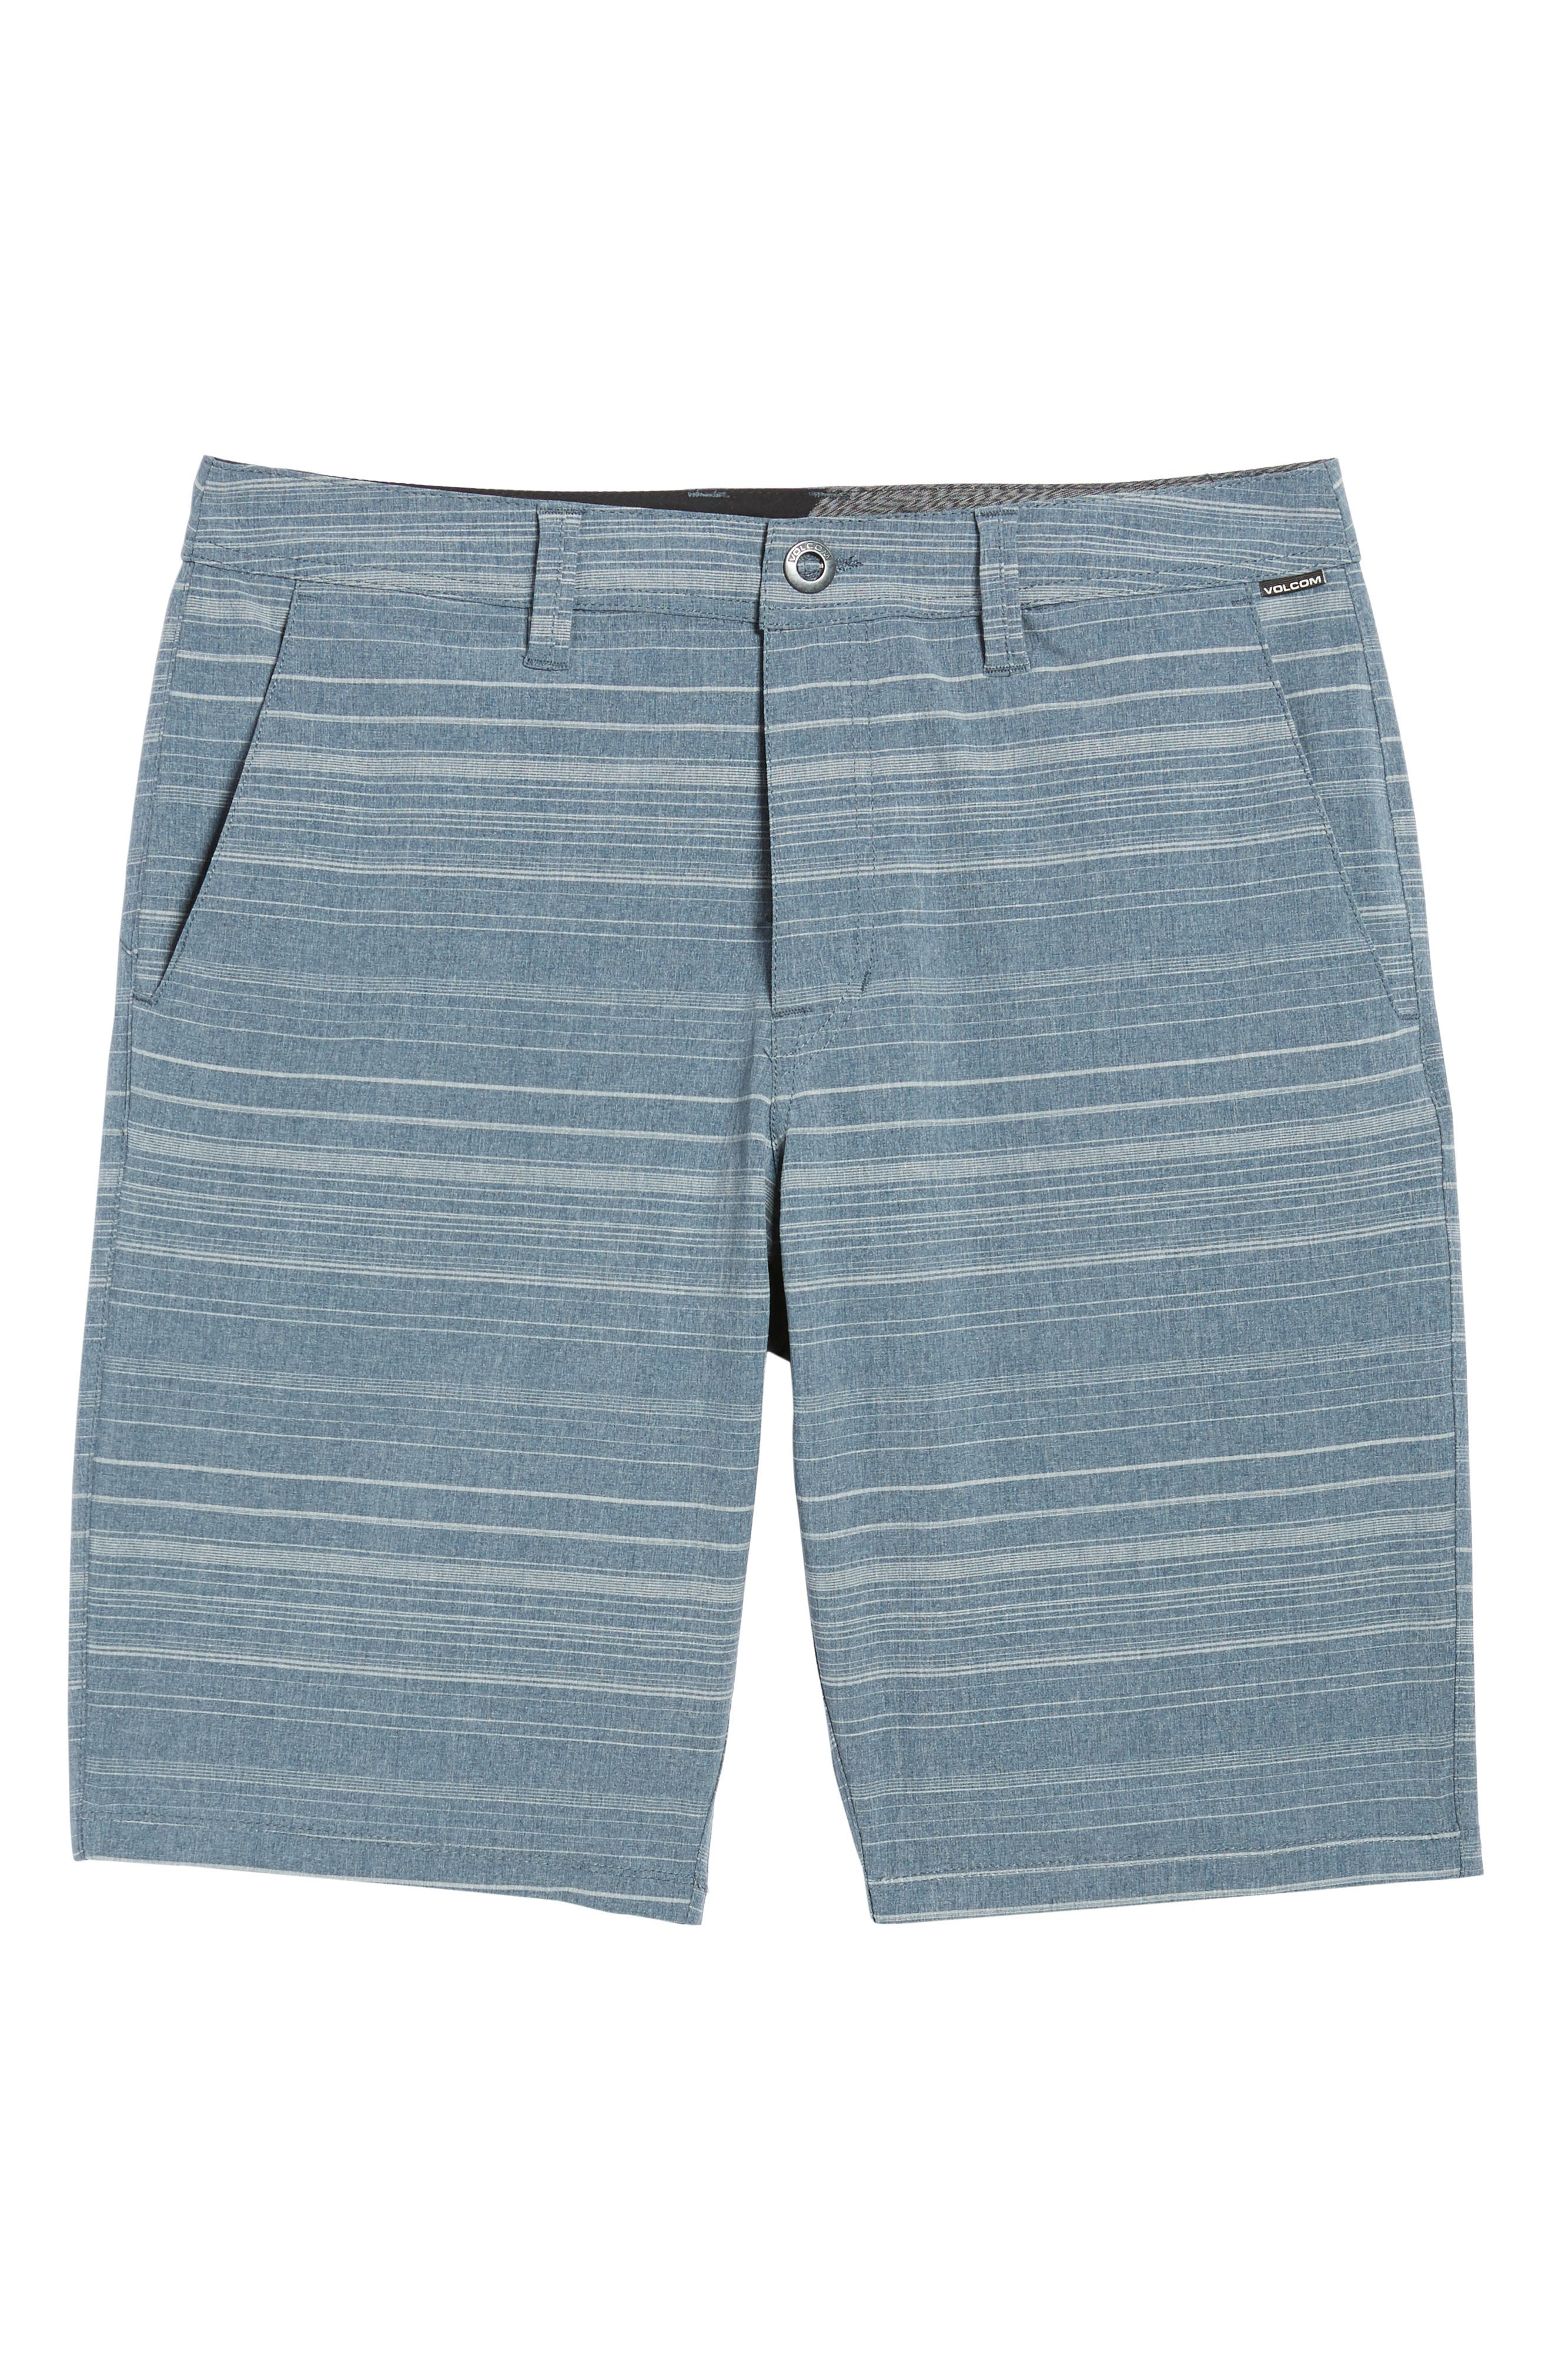 Surf N' Turf Mix Hybrid Shorts,                             Alternate thumbnail 32, color,